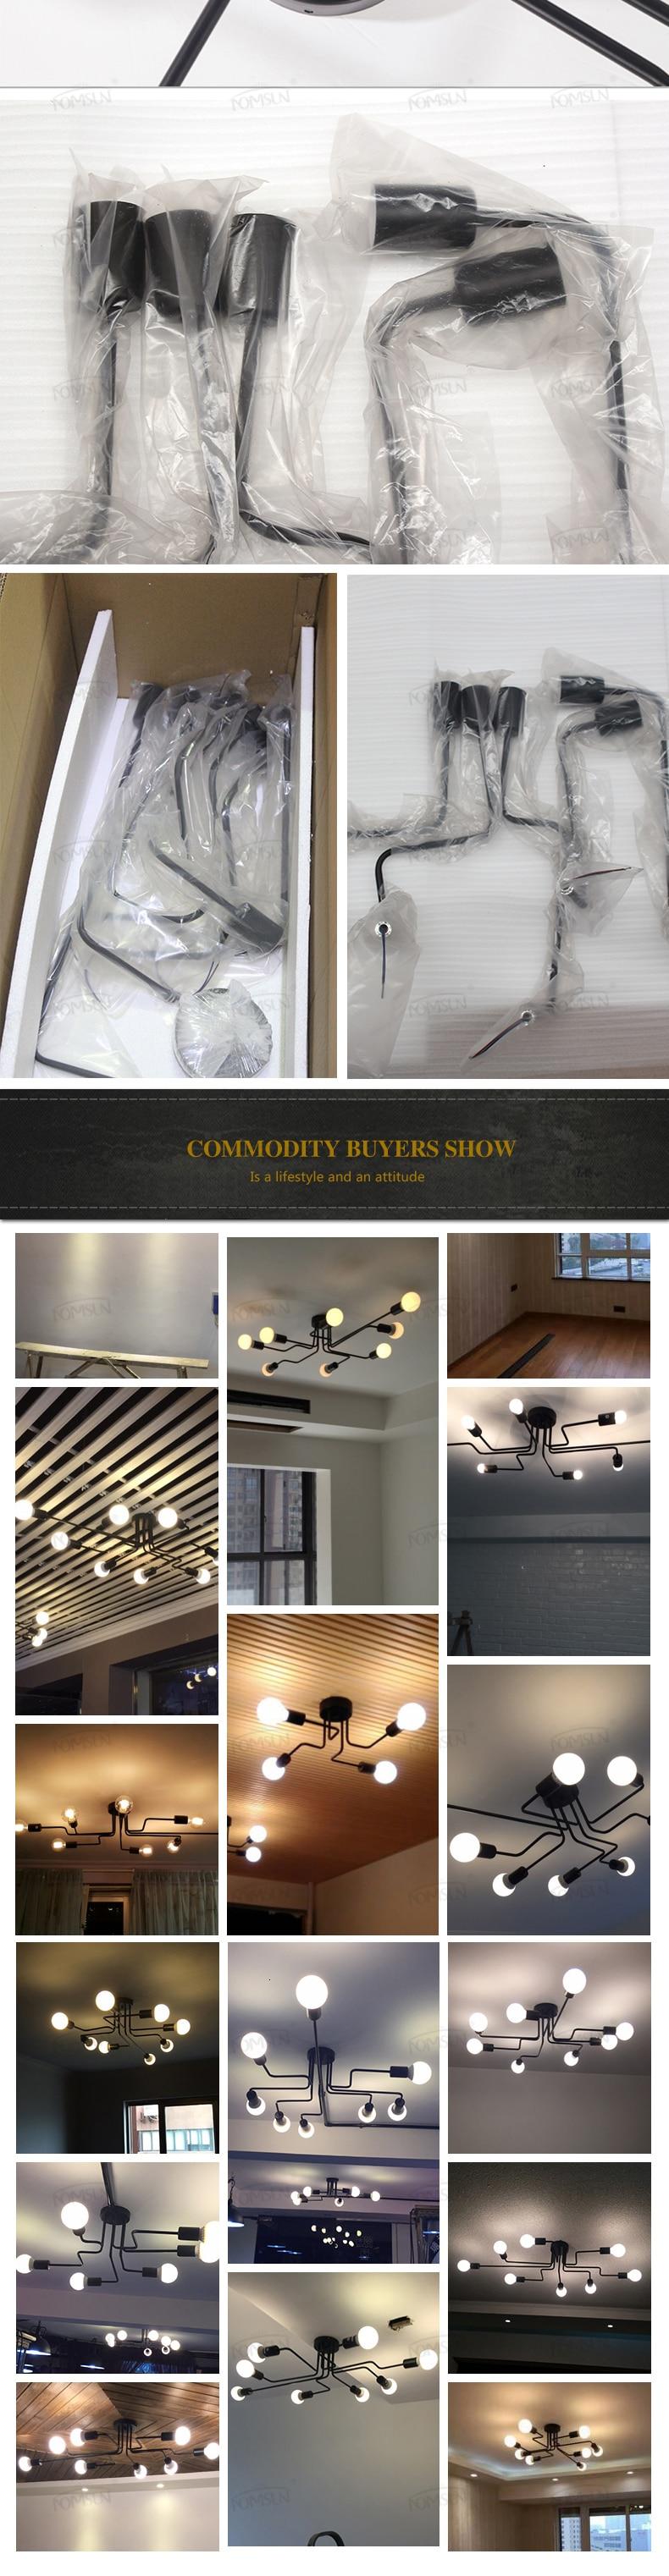 H3db08347434841d1894fea37404926996 vintage ceiling lights 8 heads retro industrial lamparas de techo restaurant loft modern ceiling lamp bar cafe dining room light